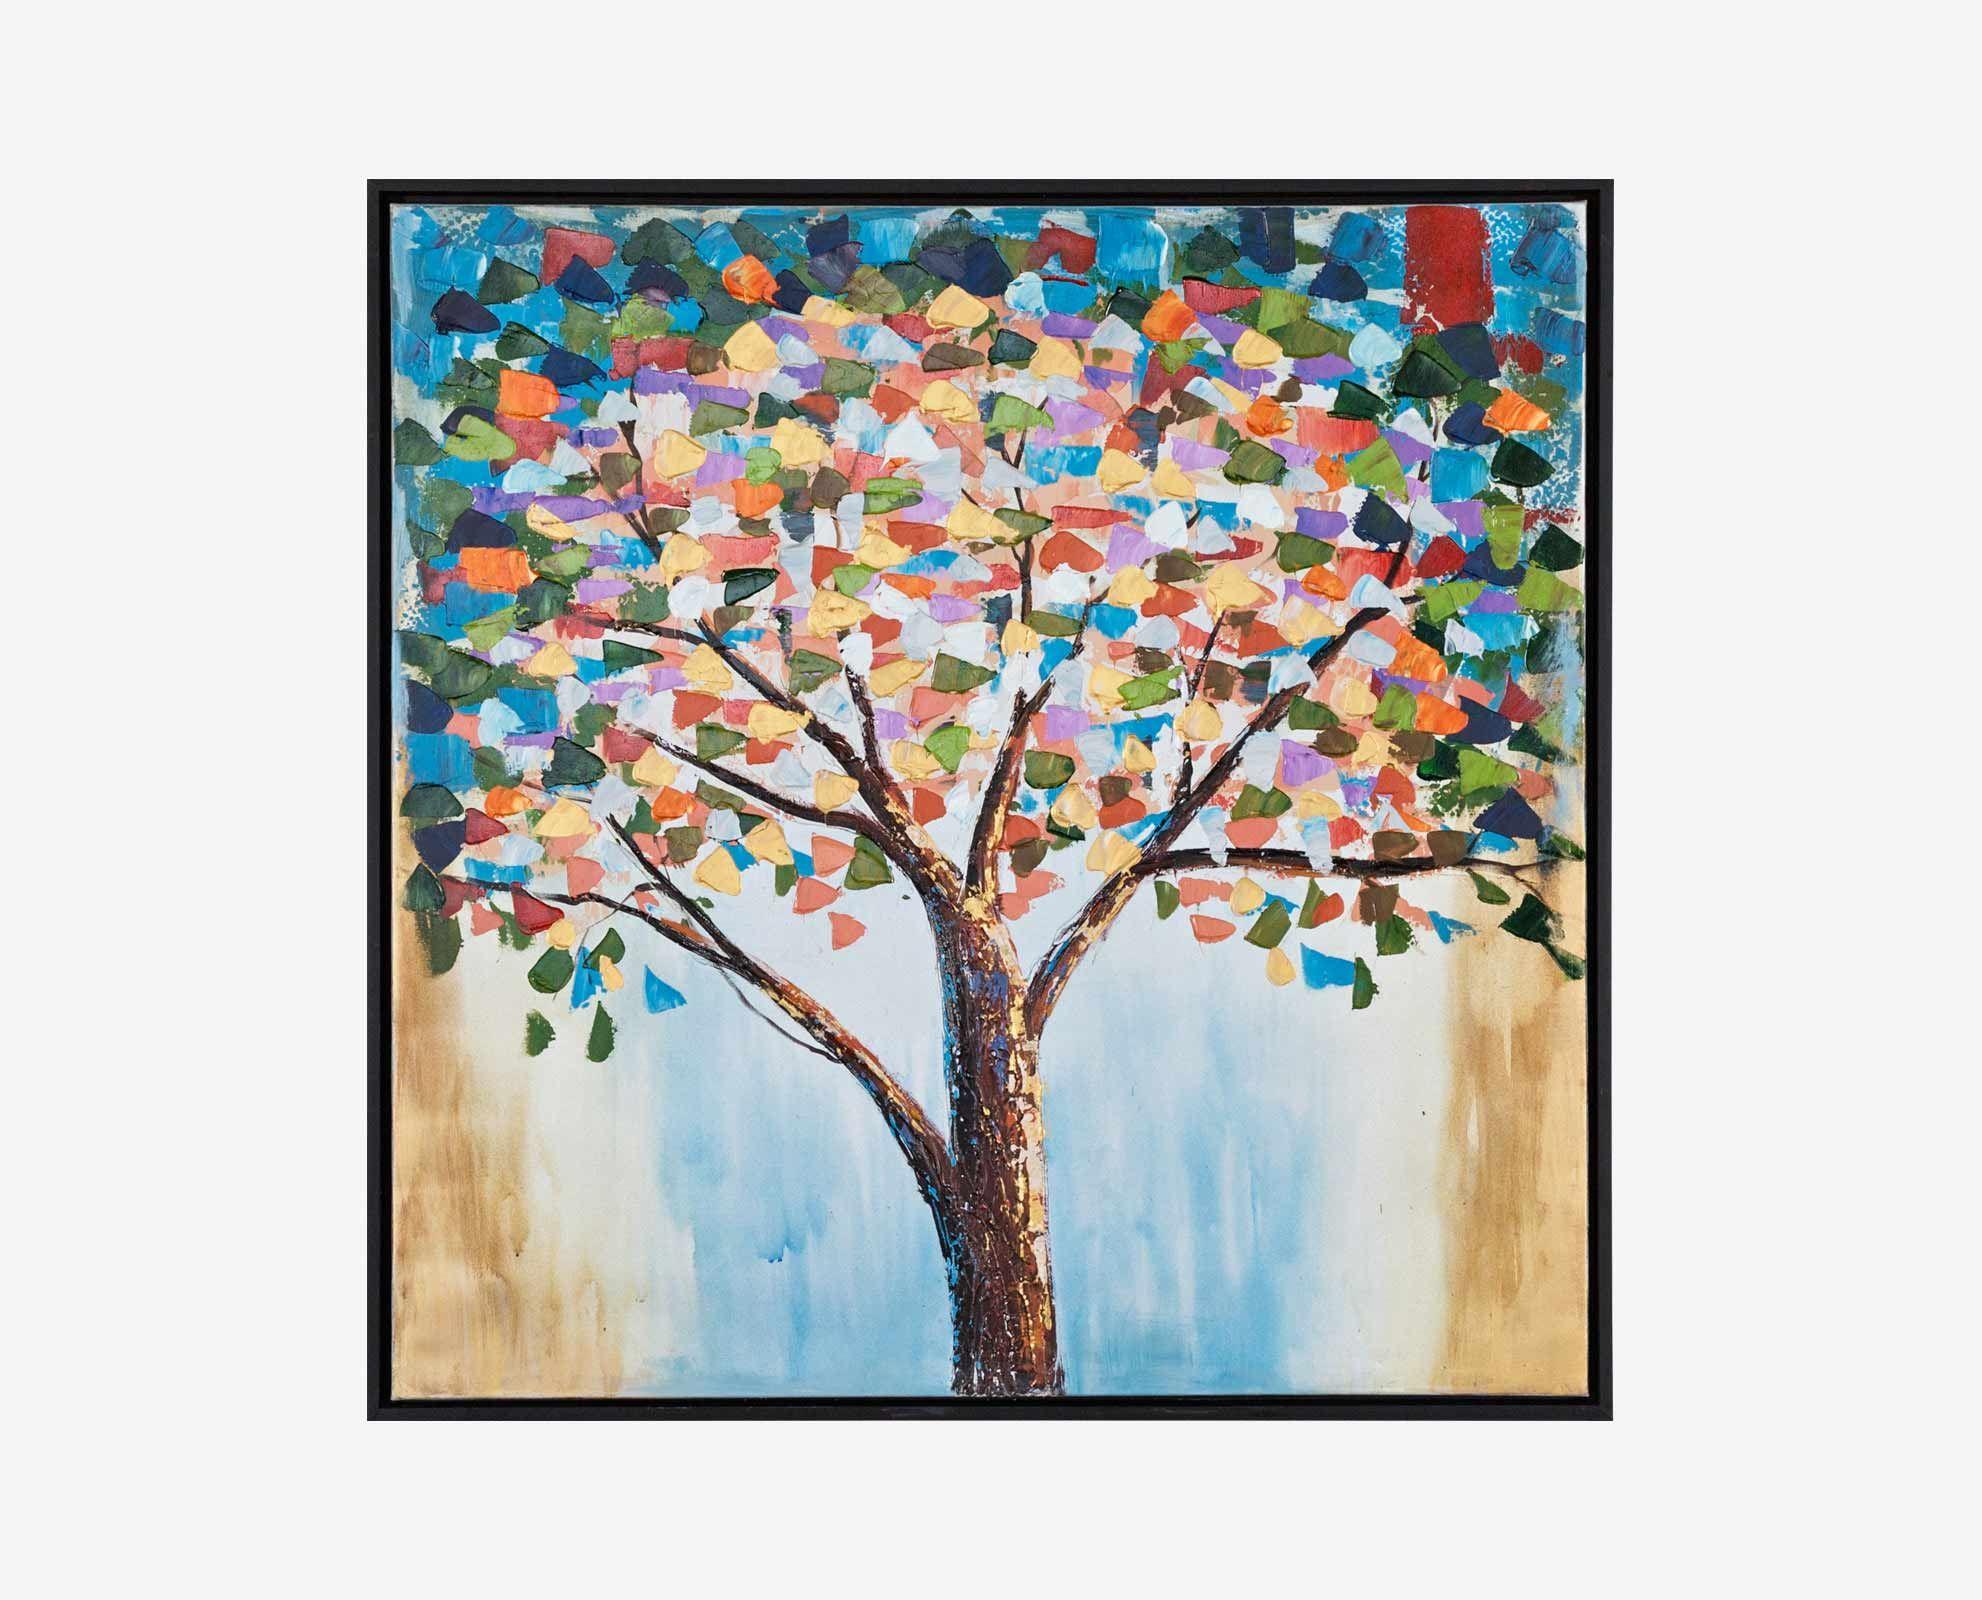 Acmena Oil Painting Wall Art Dania Painting Oil Painting Art